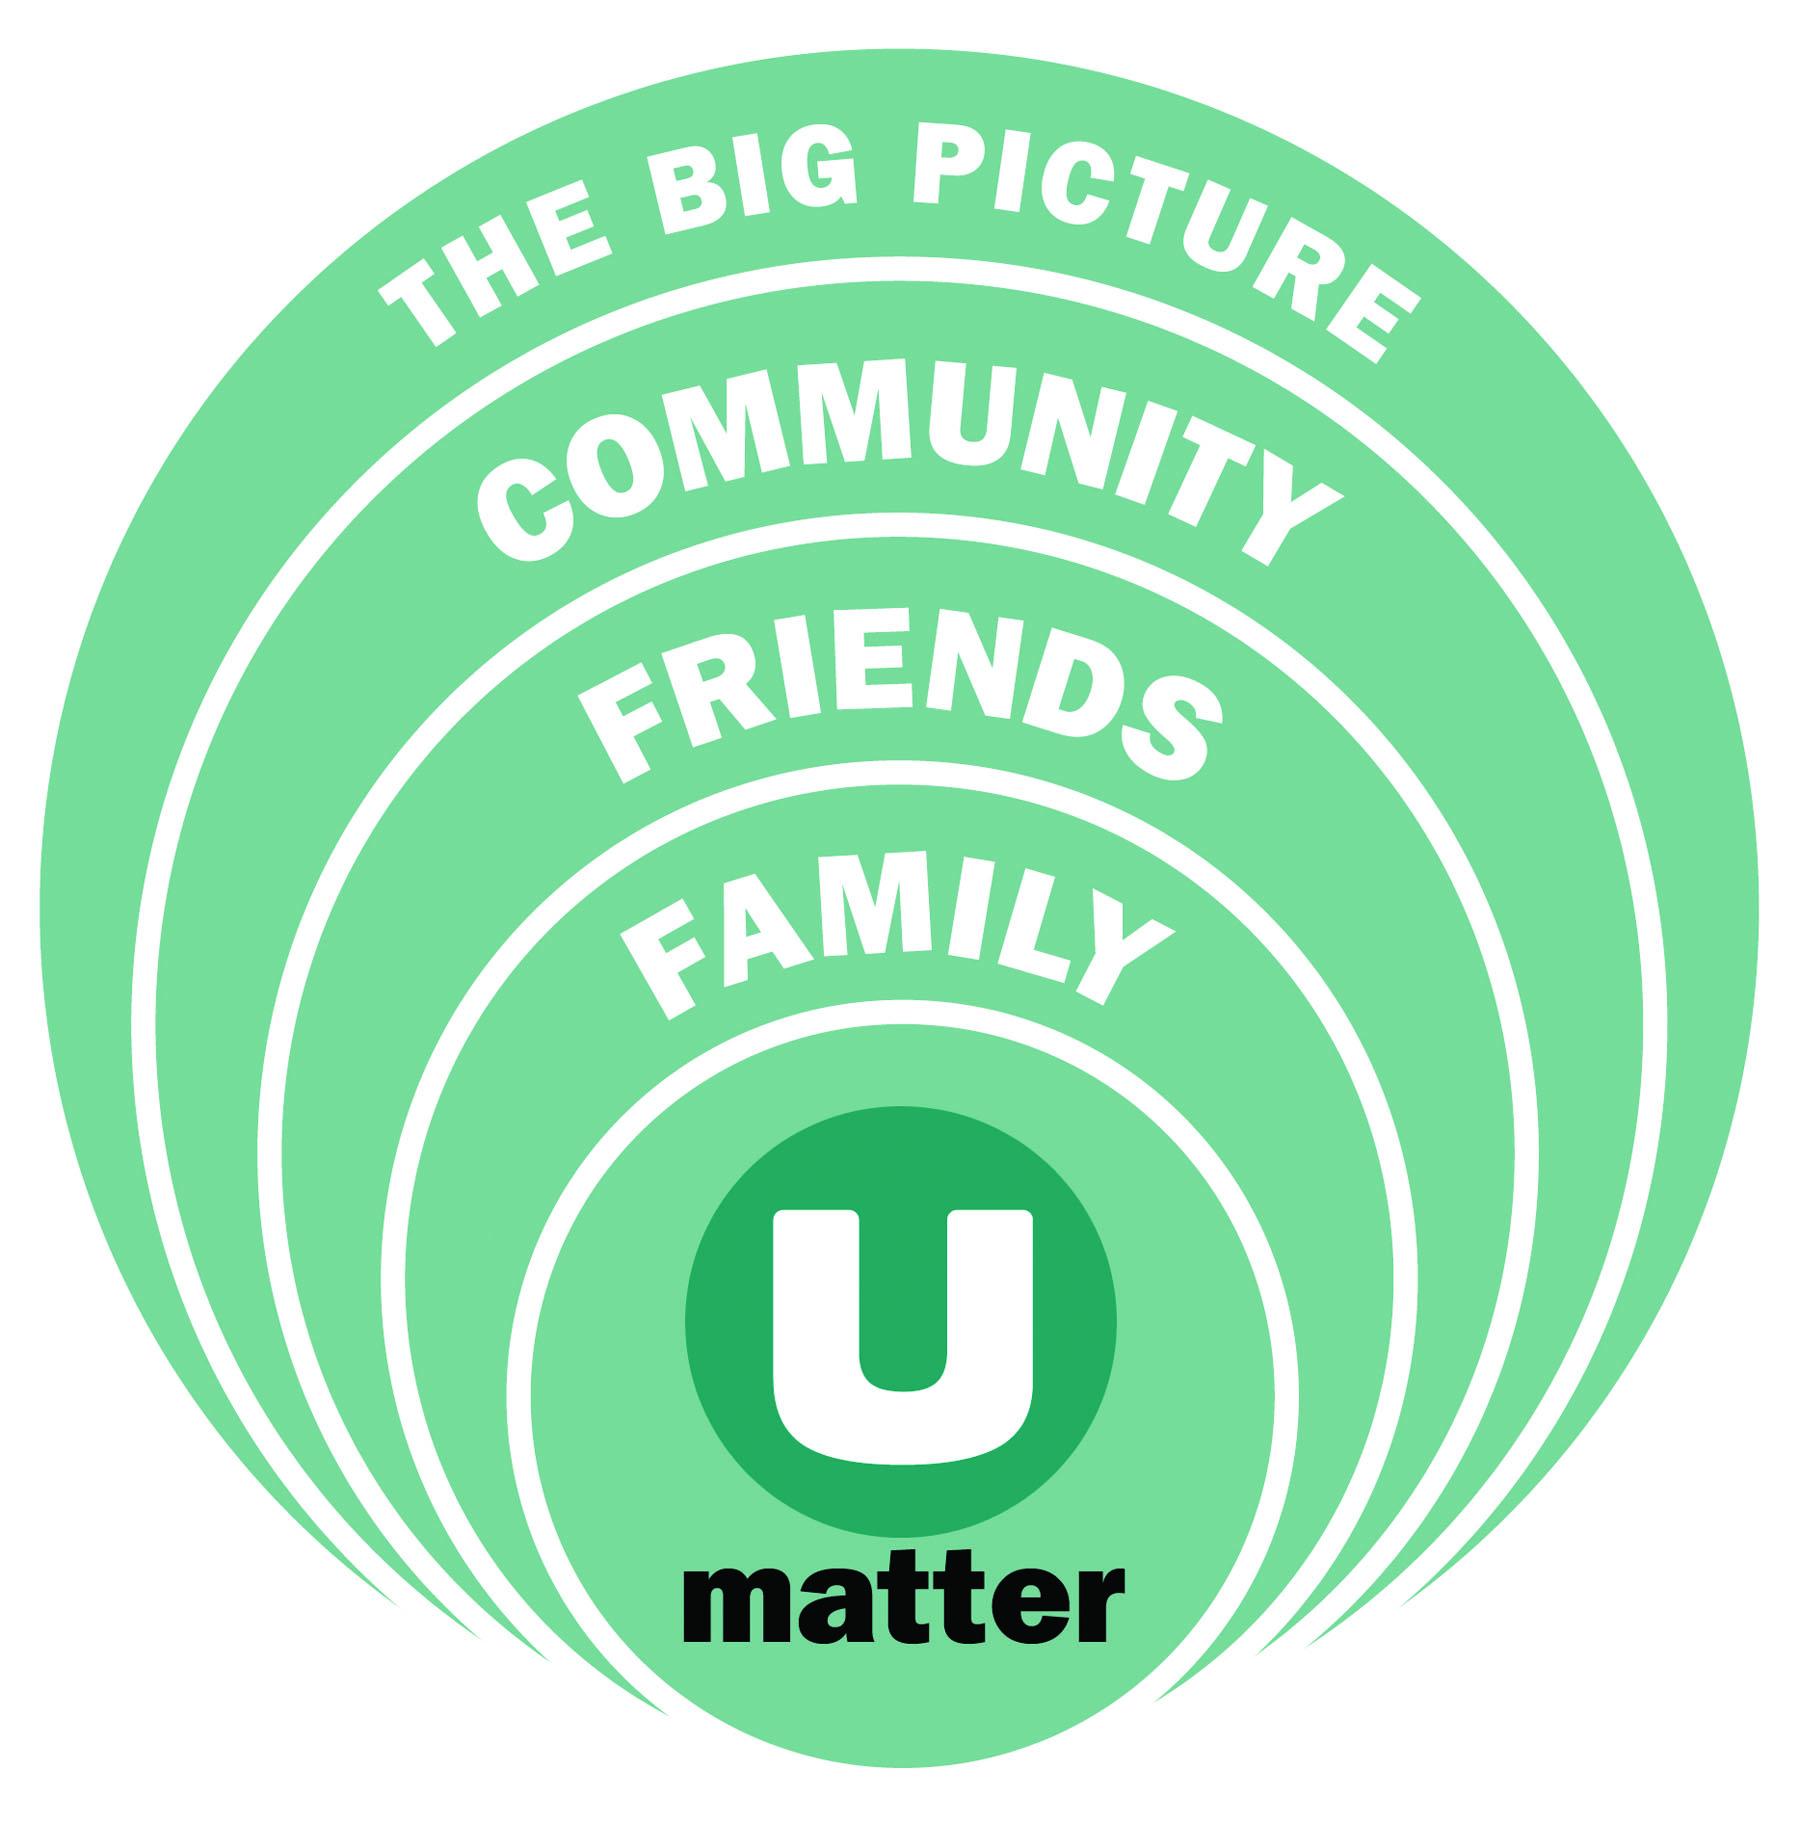 The Big Picture - Community - Friends - Family - U Matter